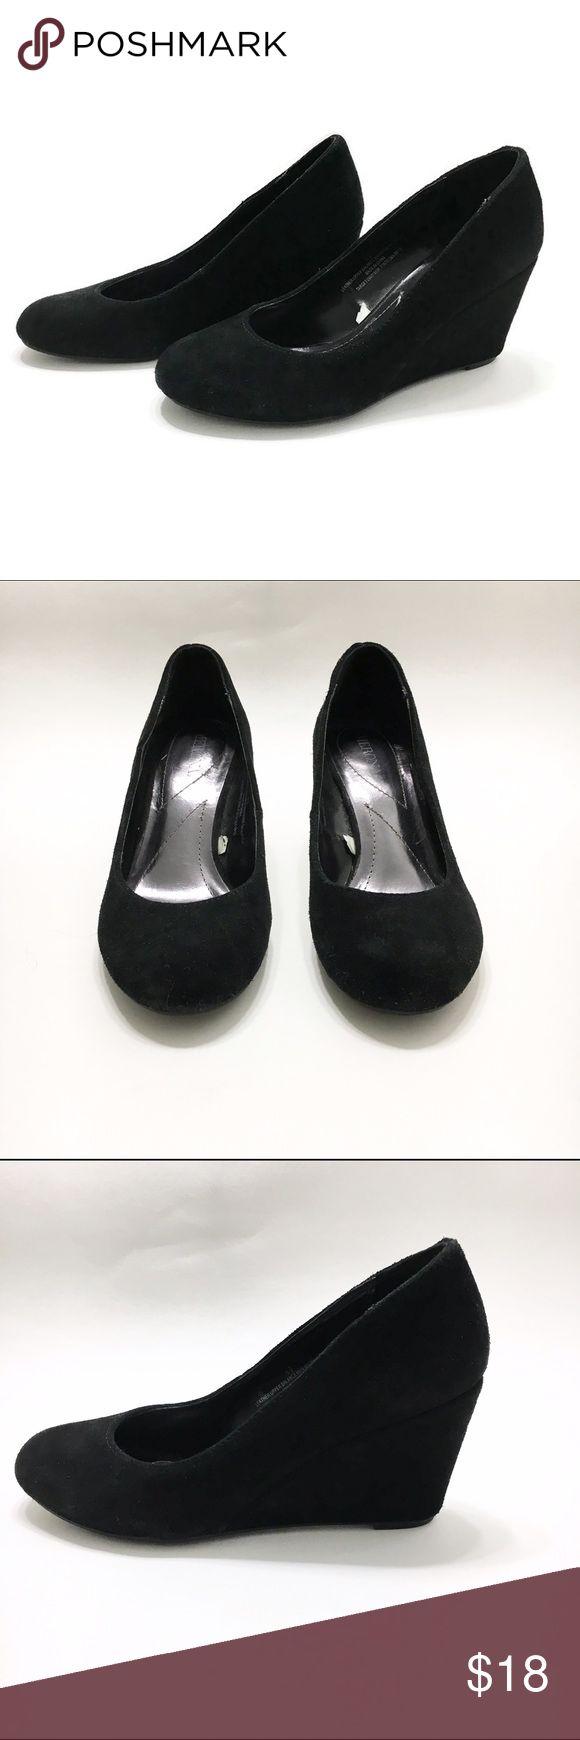 Merona Wedge Pumps Merona Ellen Wedge Pumps Solid black  Faux suede SIZE: Women's 5.5 Merona Shoes Wedges